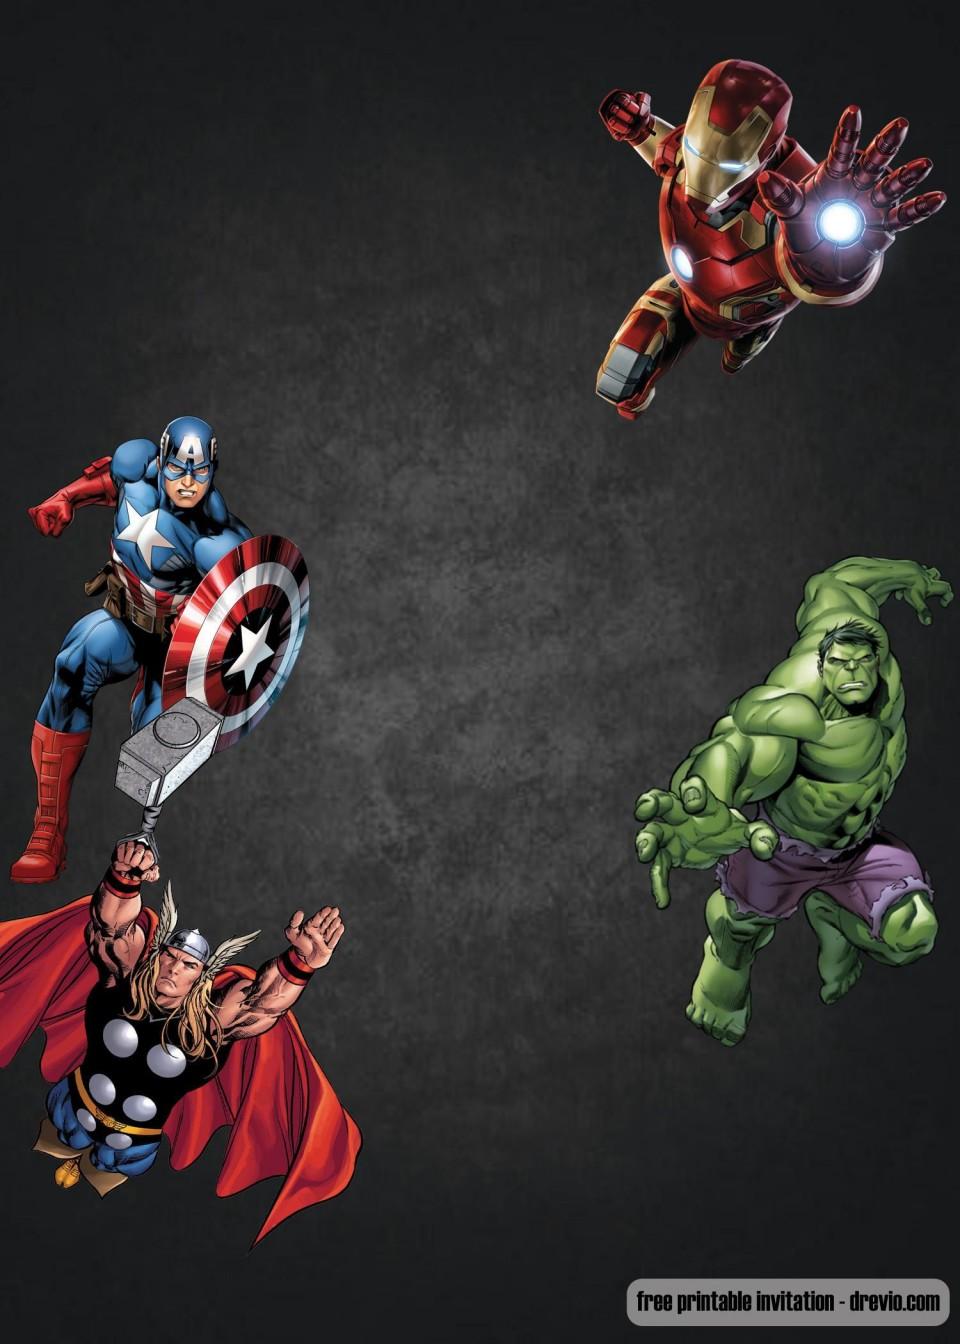 006 Phenomenal Superhero Birthday Invitation Template Free Image 960